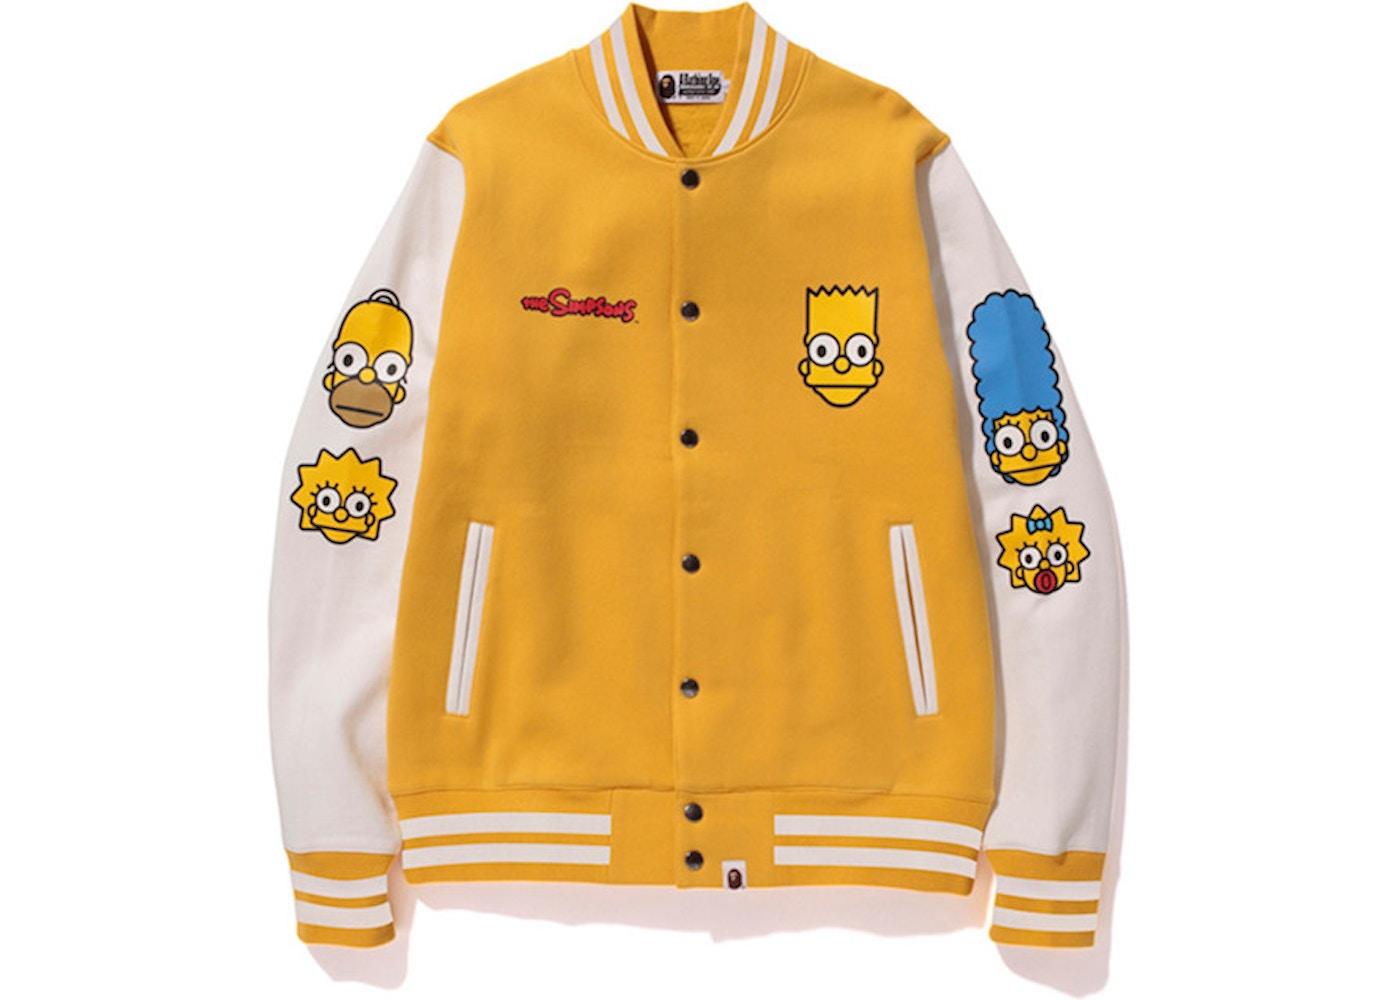 945549cc2 BAPE X The Simpsons Baby Milo Varsity Jacket Yellow - FW14